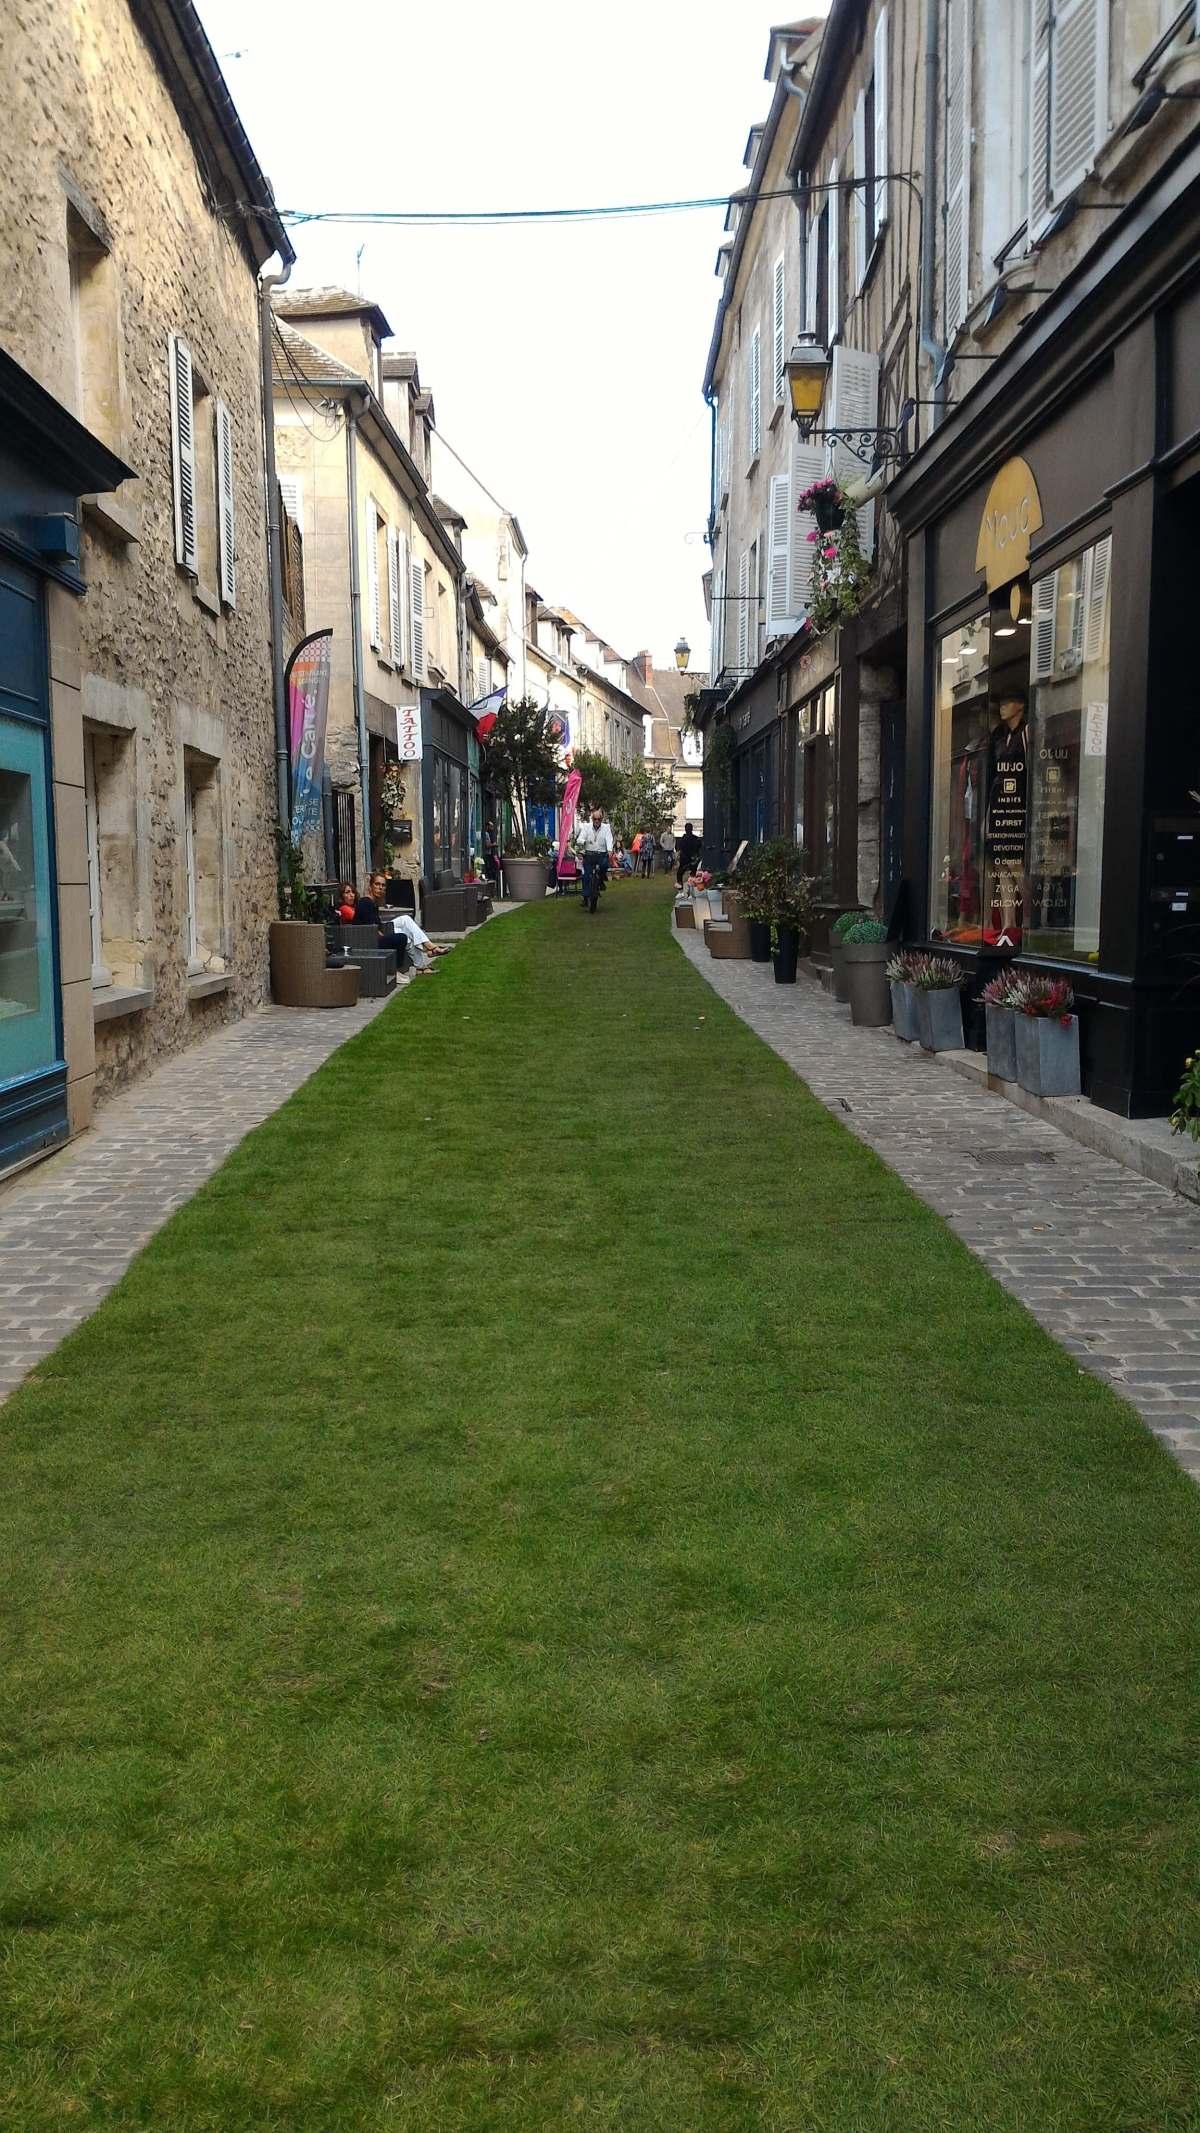 rue-verte-pelouse-senlis-st-fiacre